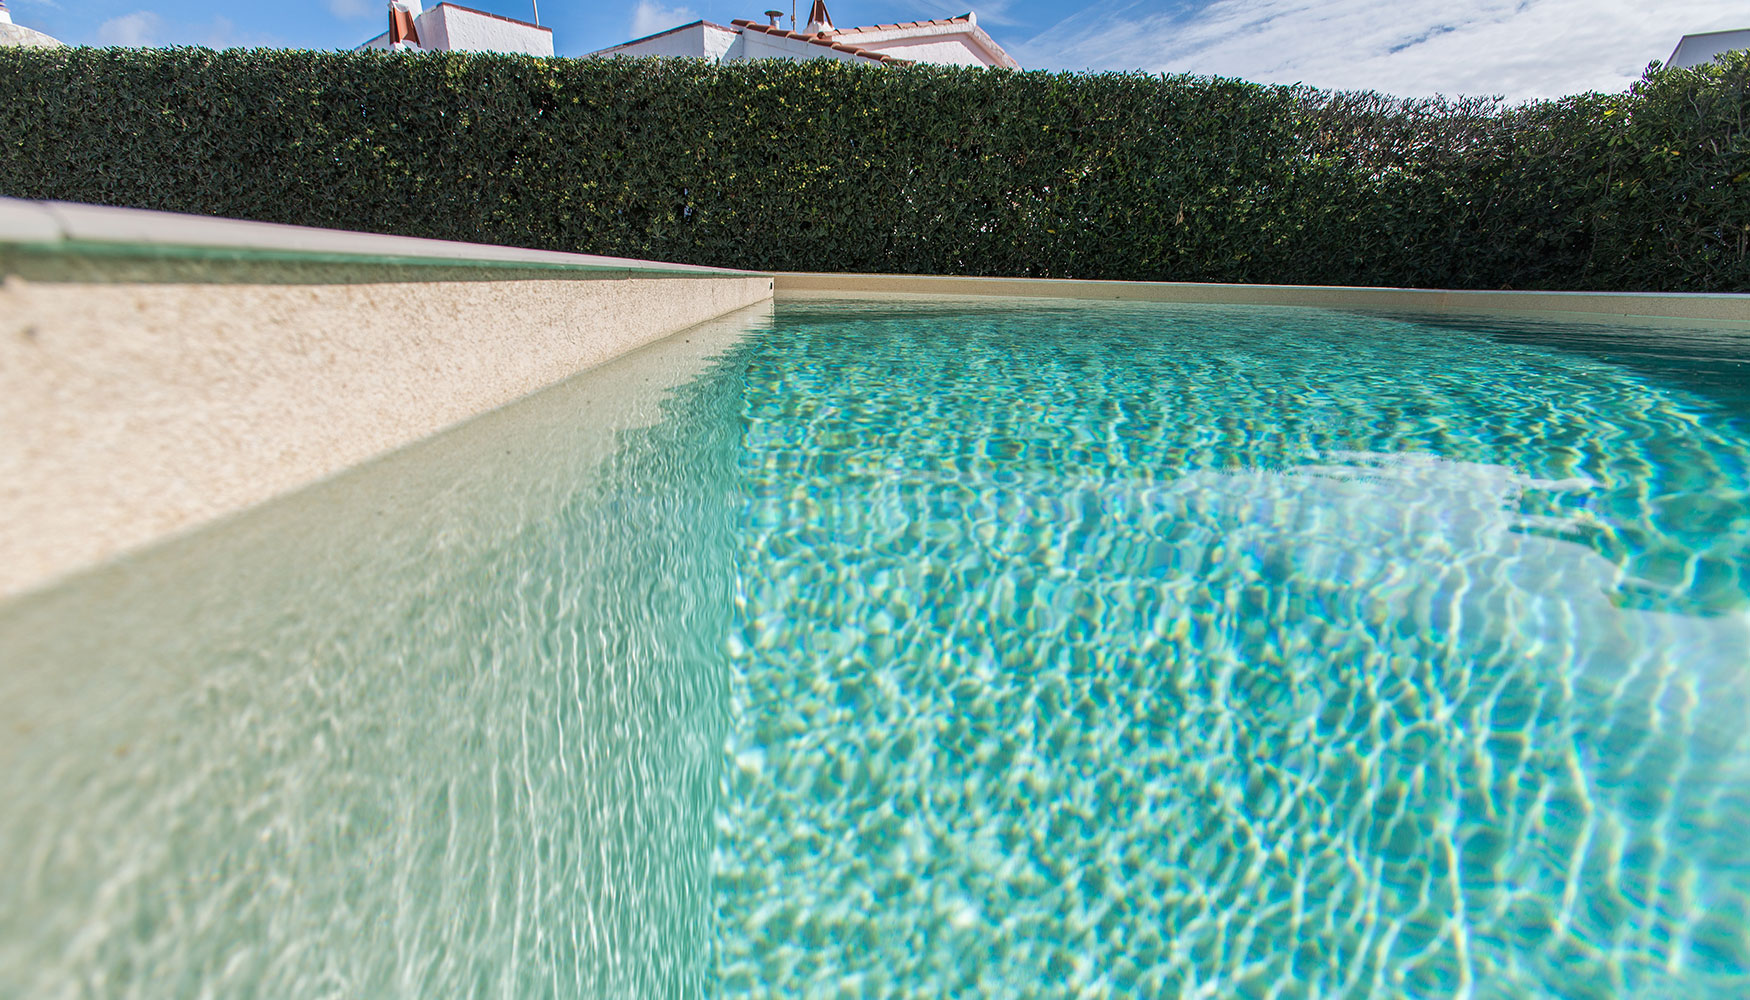 Renolit alkorplan touch un revestimiento para piscinas en for Revestimiento de piscinas